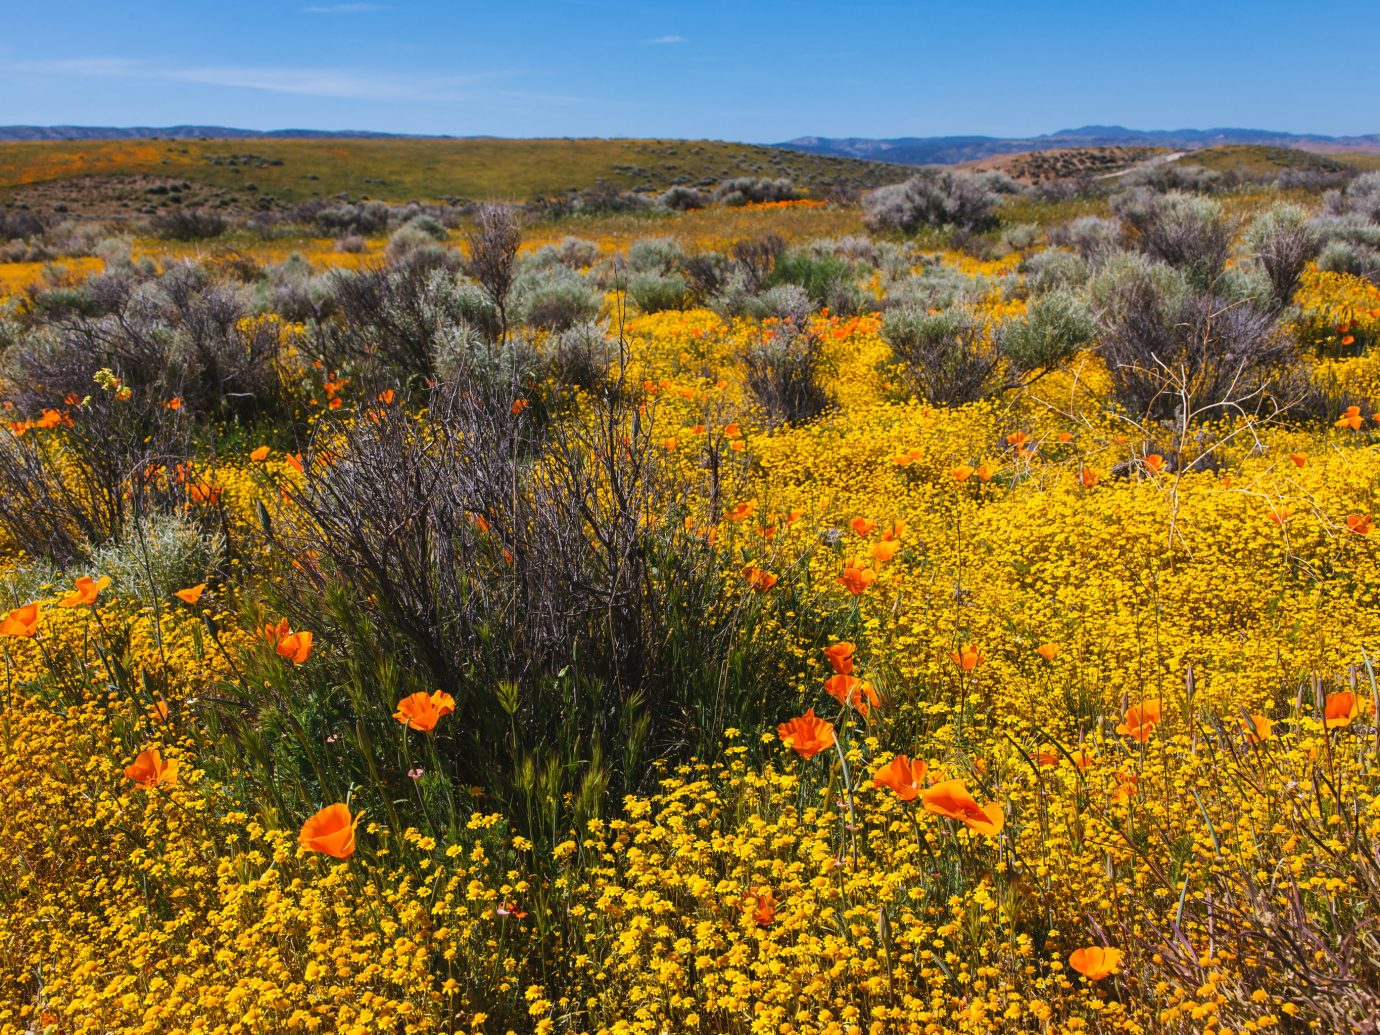 Poppy Reserve in Antelope Valley, California